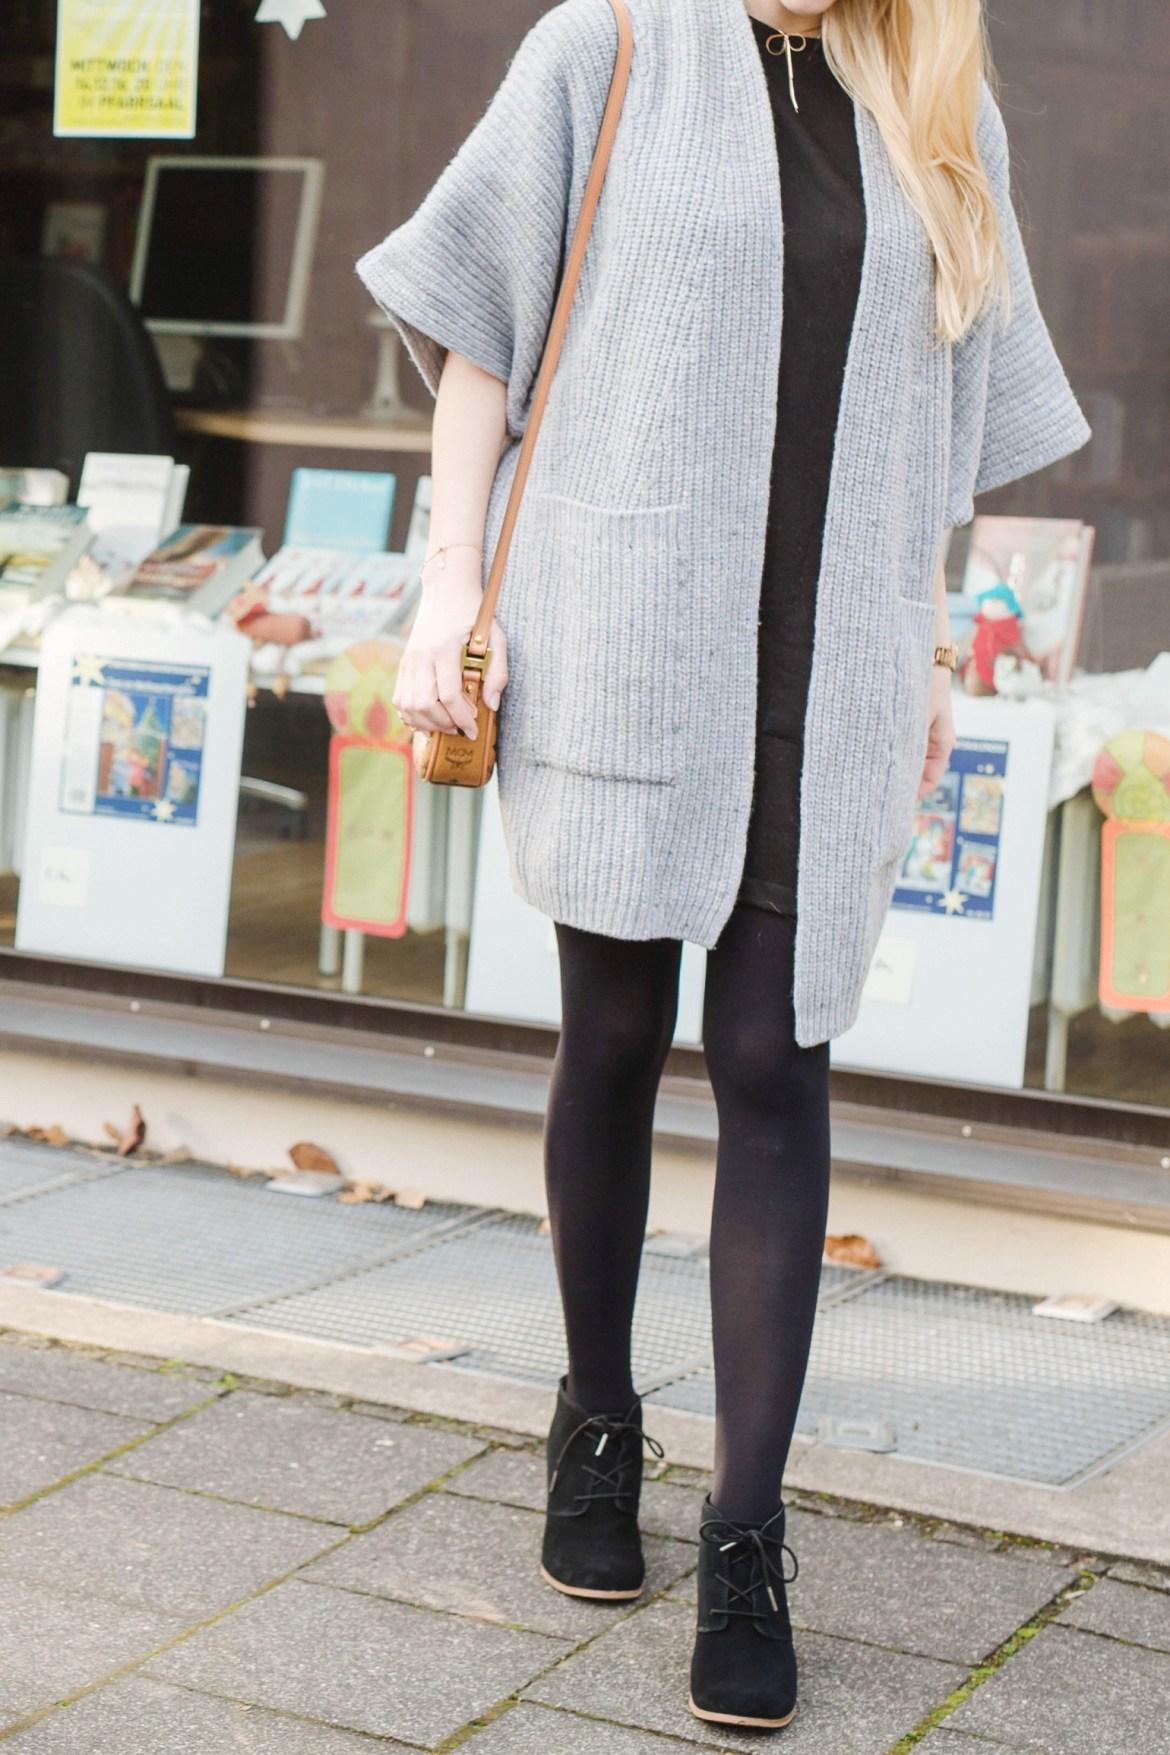 missbonnebonne-fashionblog-koeln-festtagslook-weihnachten-outfit-hessnatur-toms-mcm-9